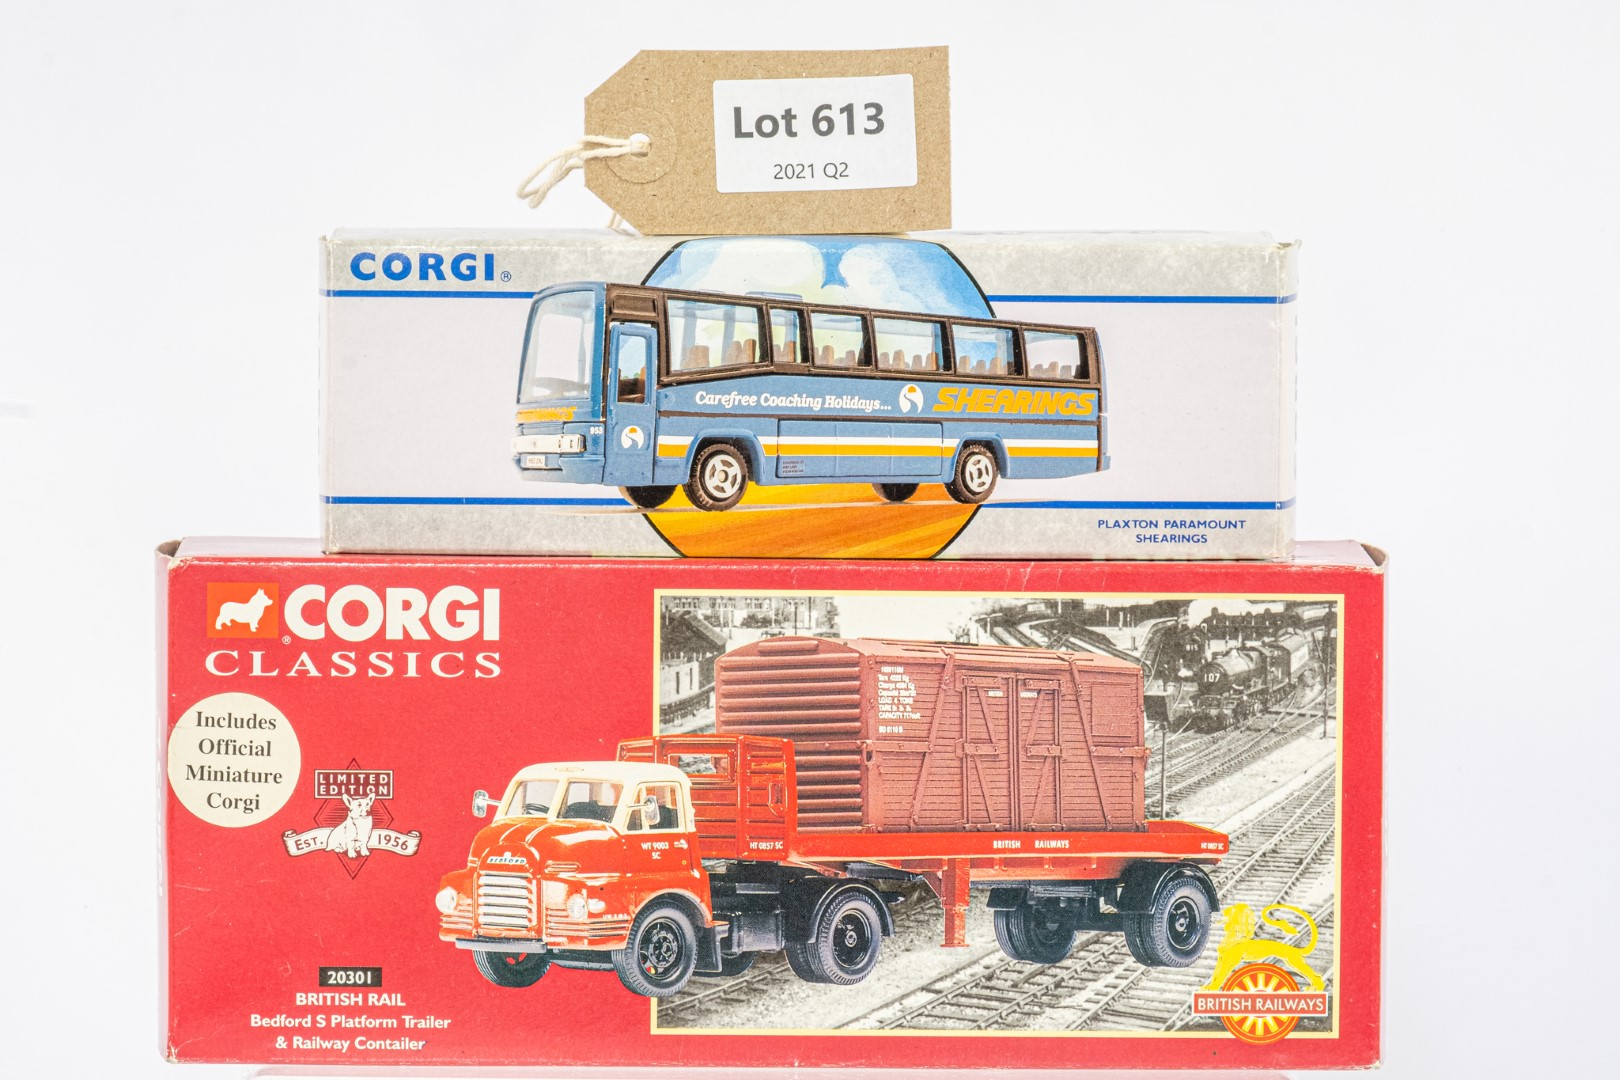 Corgi Bedford S Platform Trailer & Railway Contailer - British Rail / Plaxton Paramount - Shearings